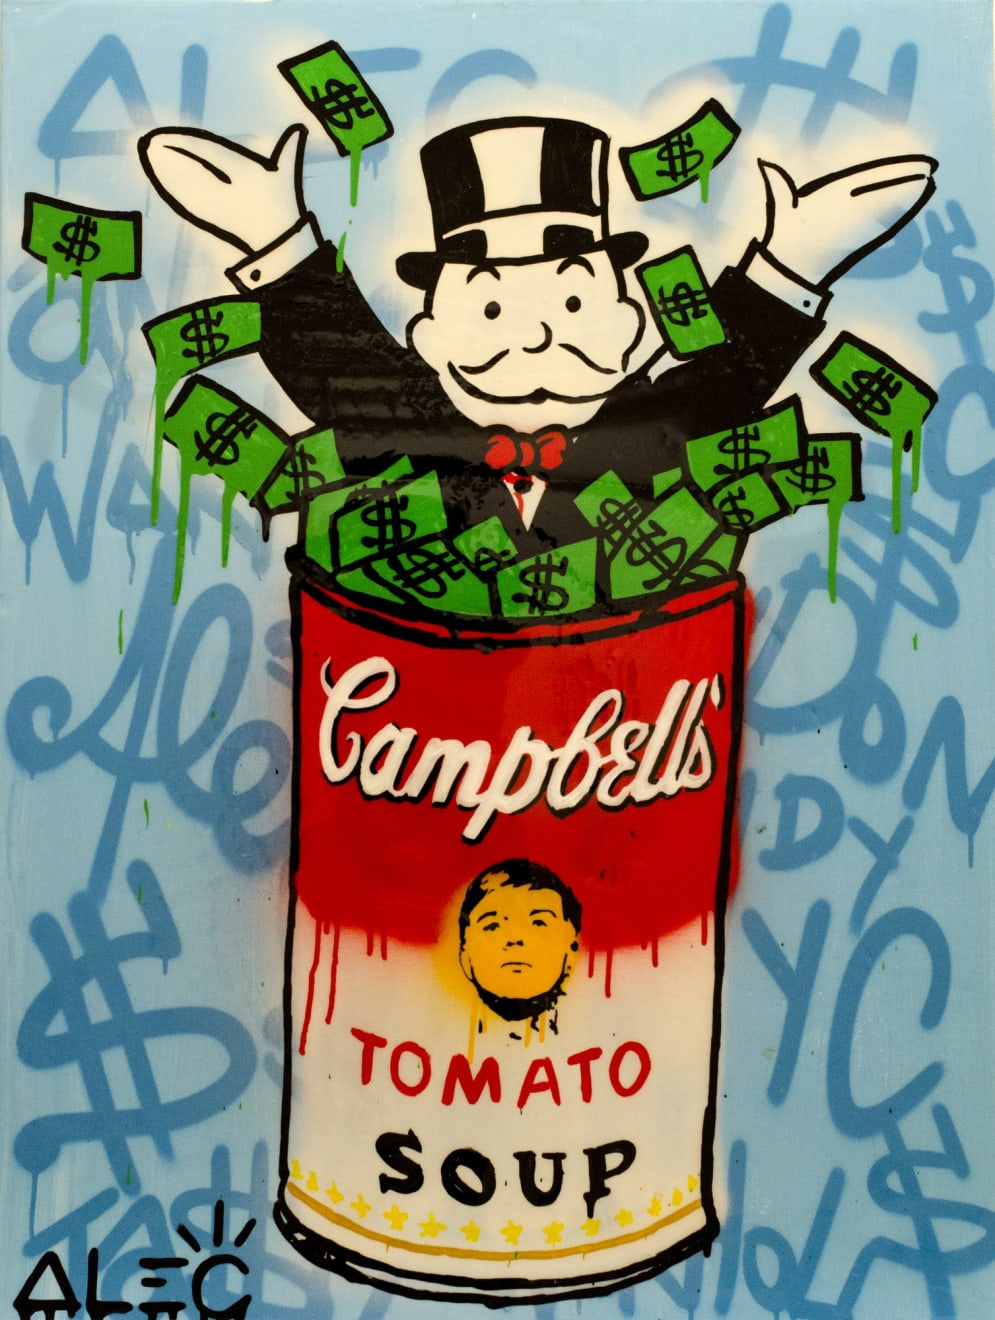 Alec Monopoly Warhol Pennybags, 2013